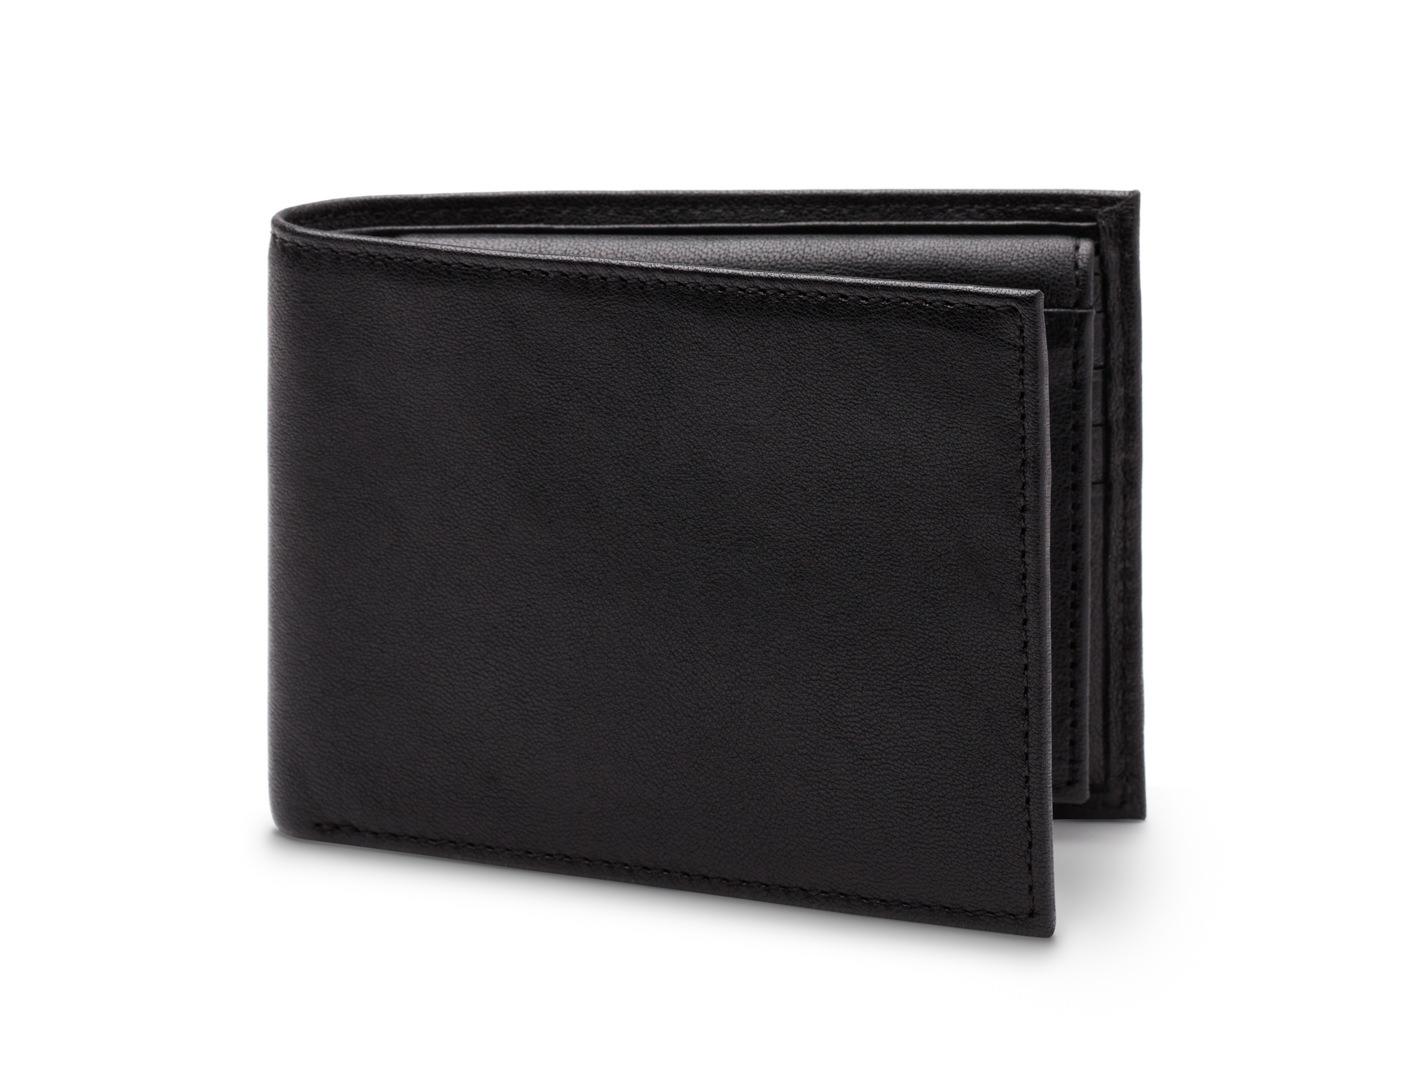 Credit Wallet w/I.D. Passcase - RFID-150 Black - 150 Black